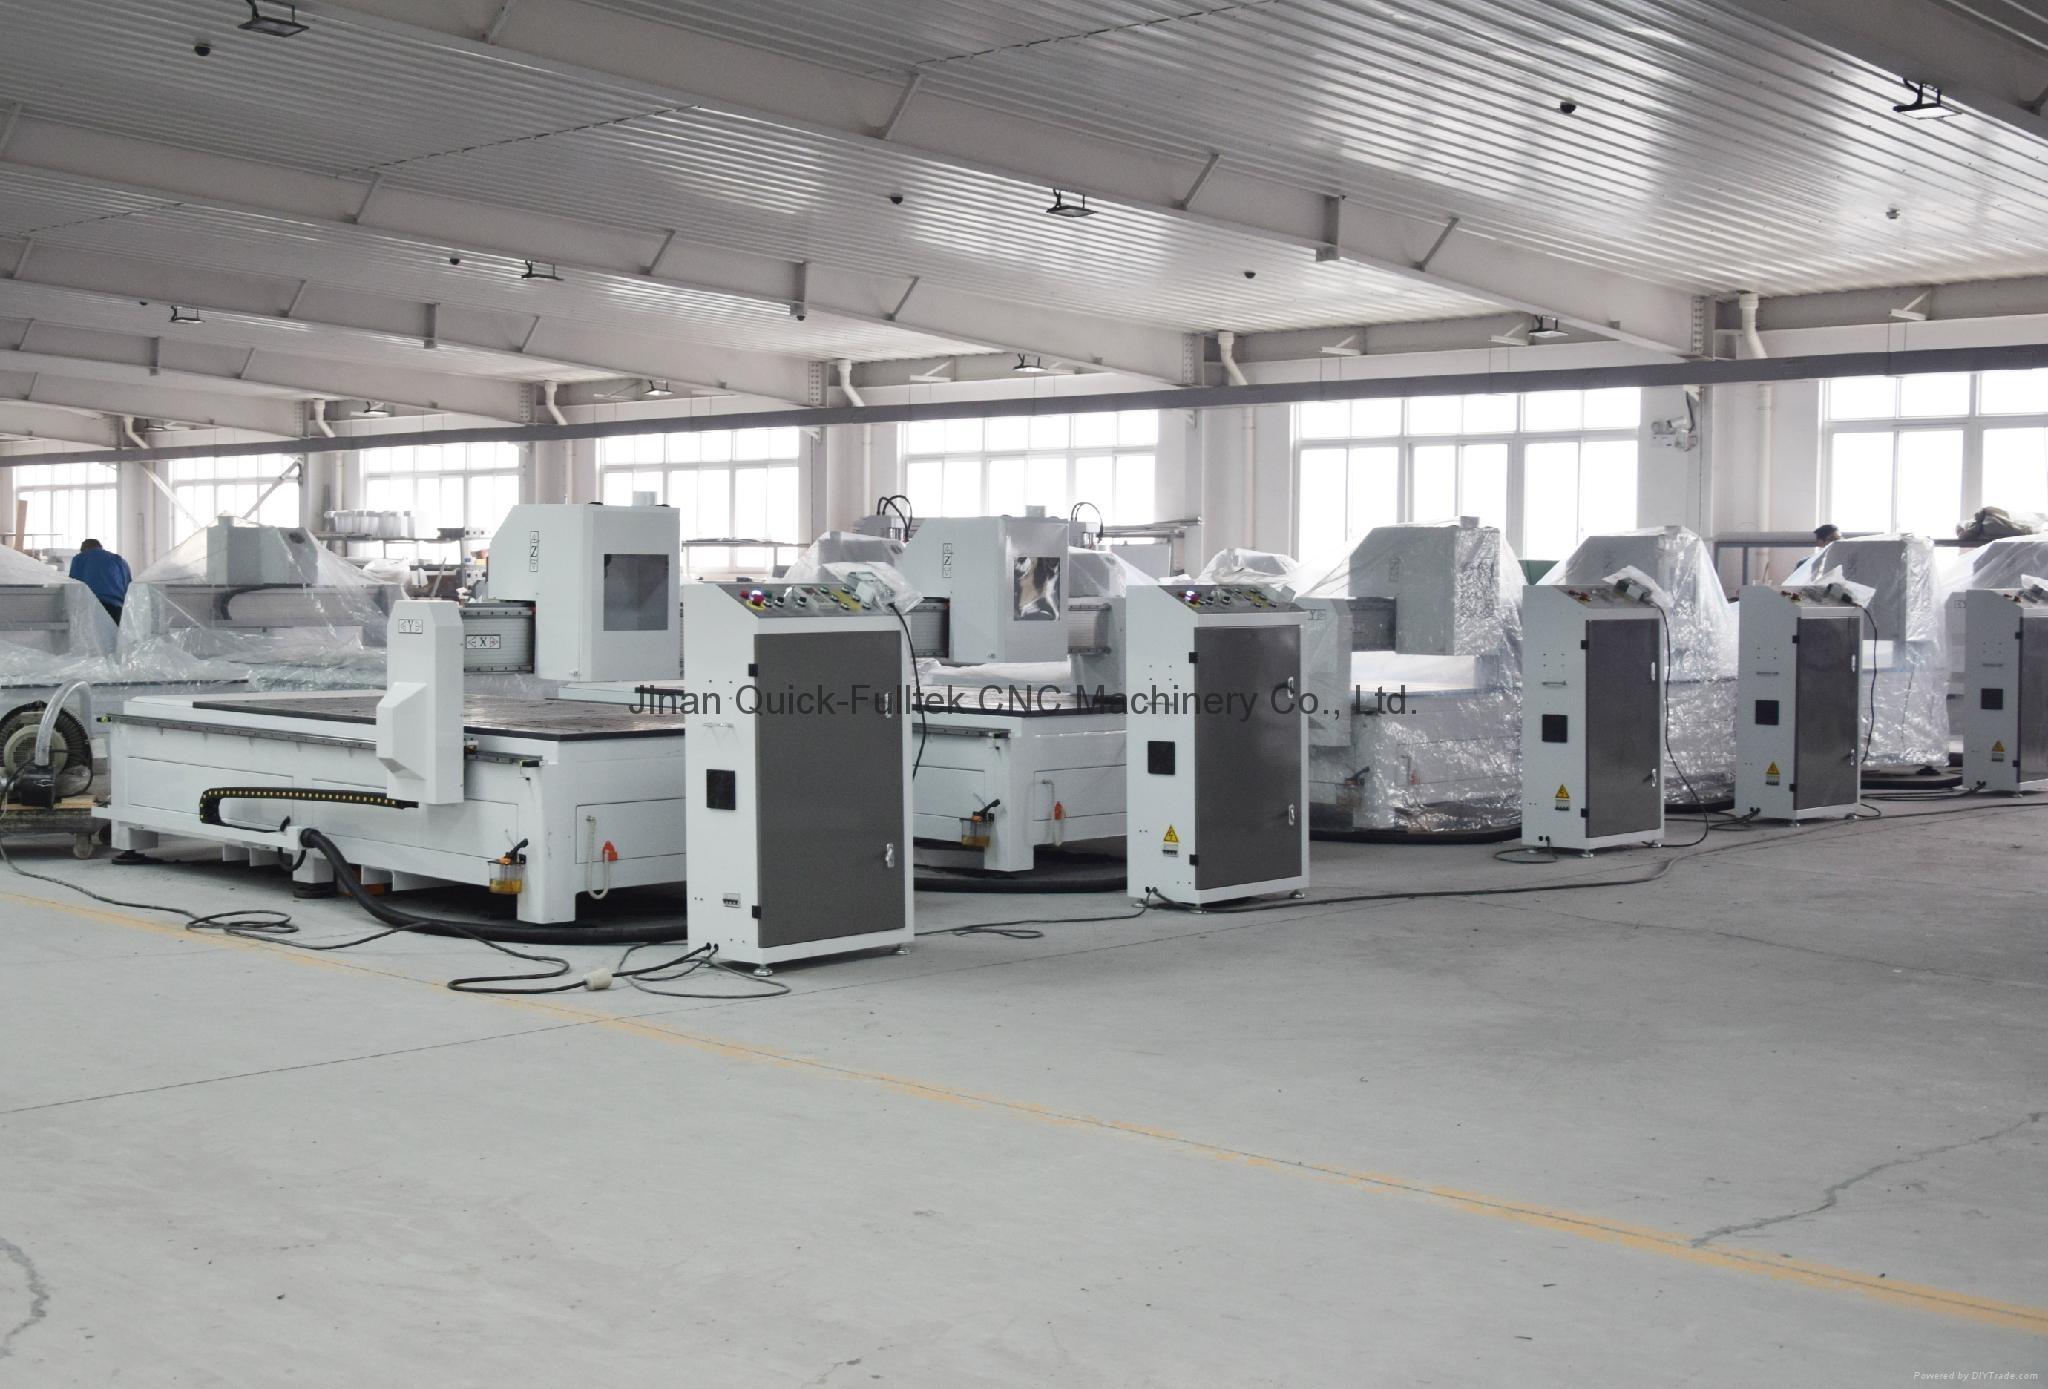 Quick CNC factory